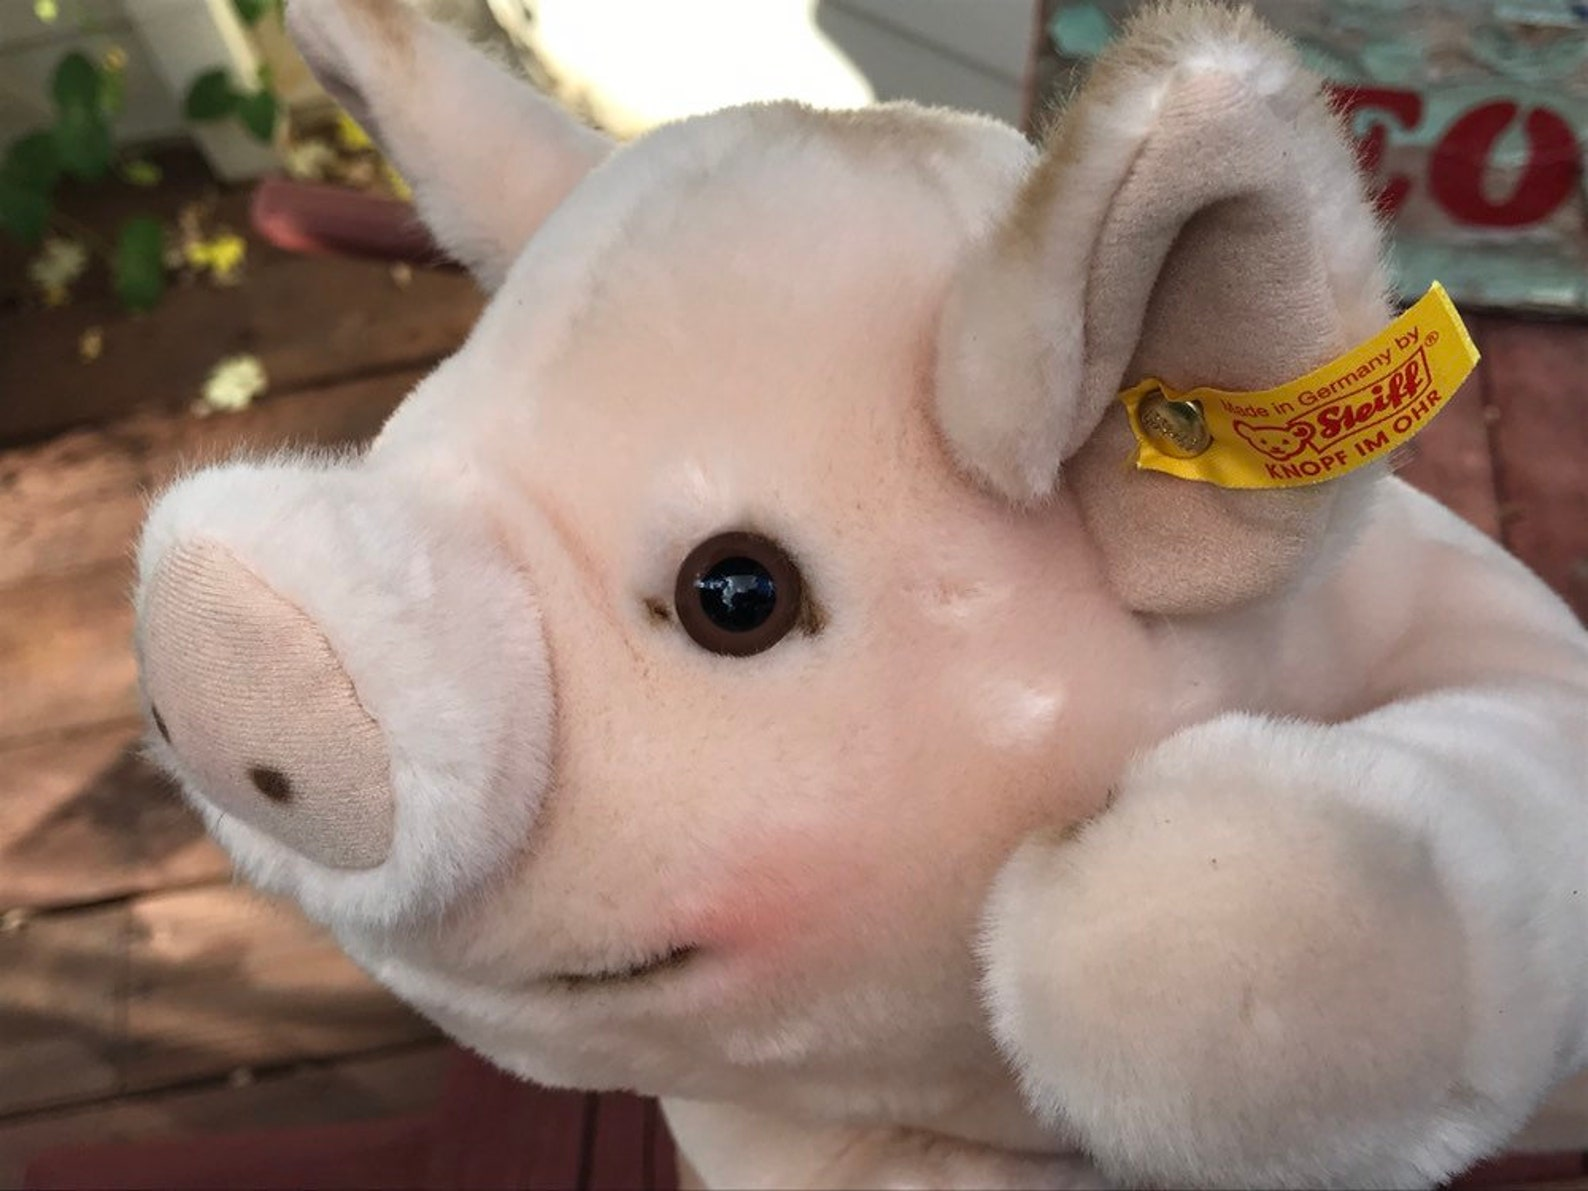 Steiff Original Plush Pig, Steiff Collectors Club Domestic Farm Animal, Made in Germany